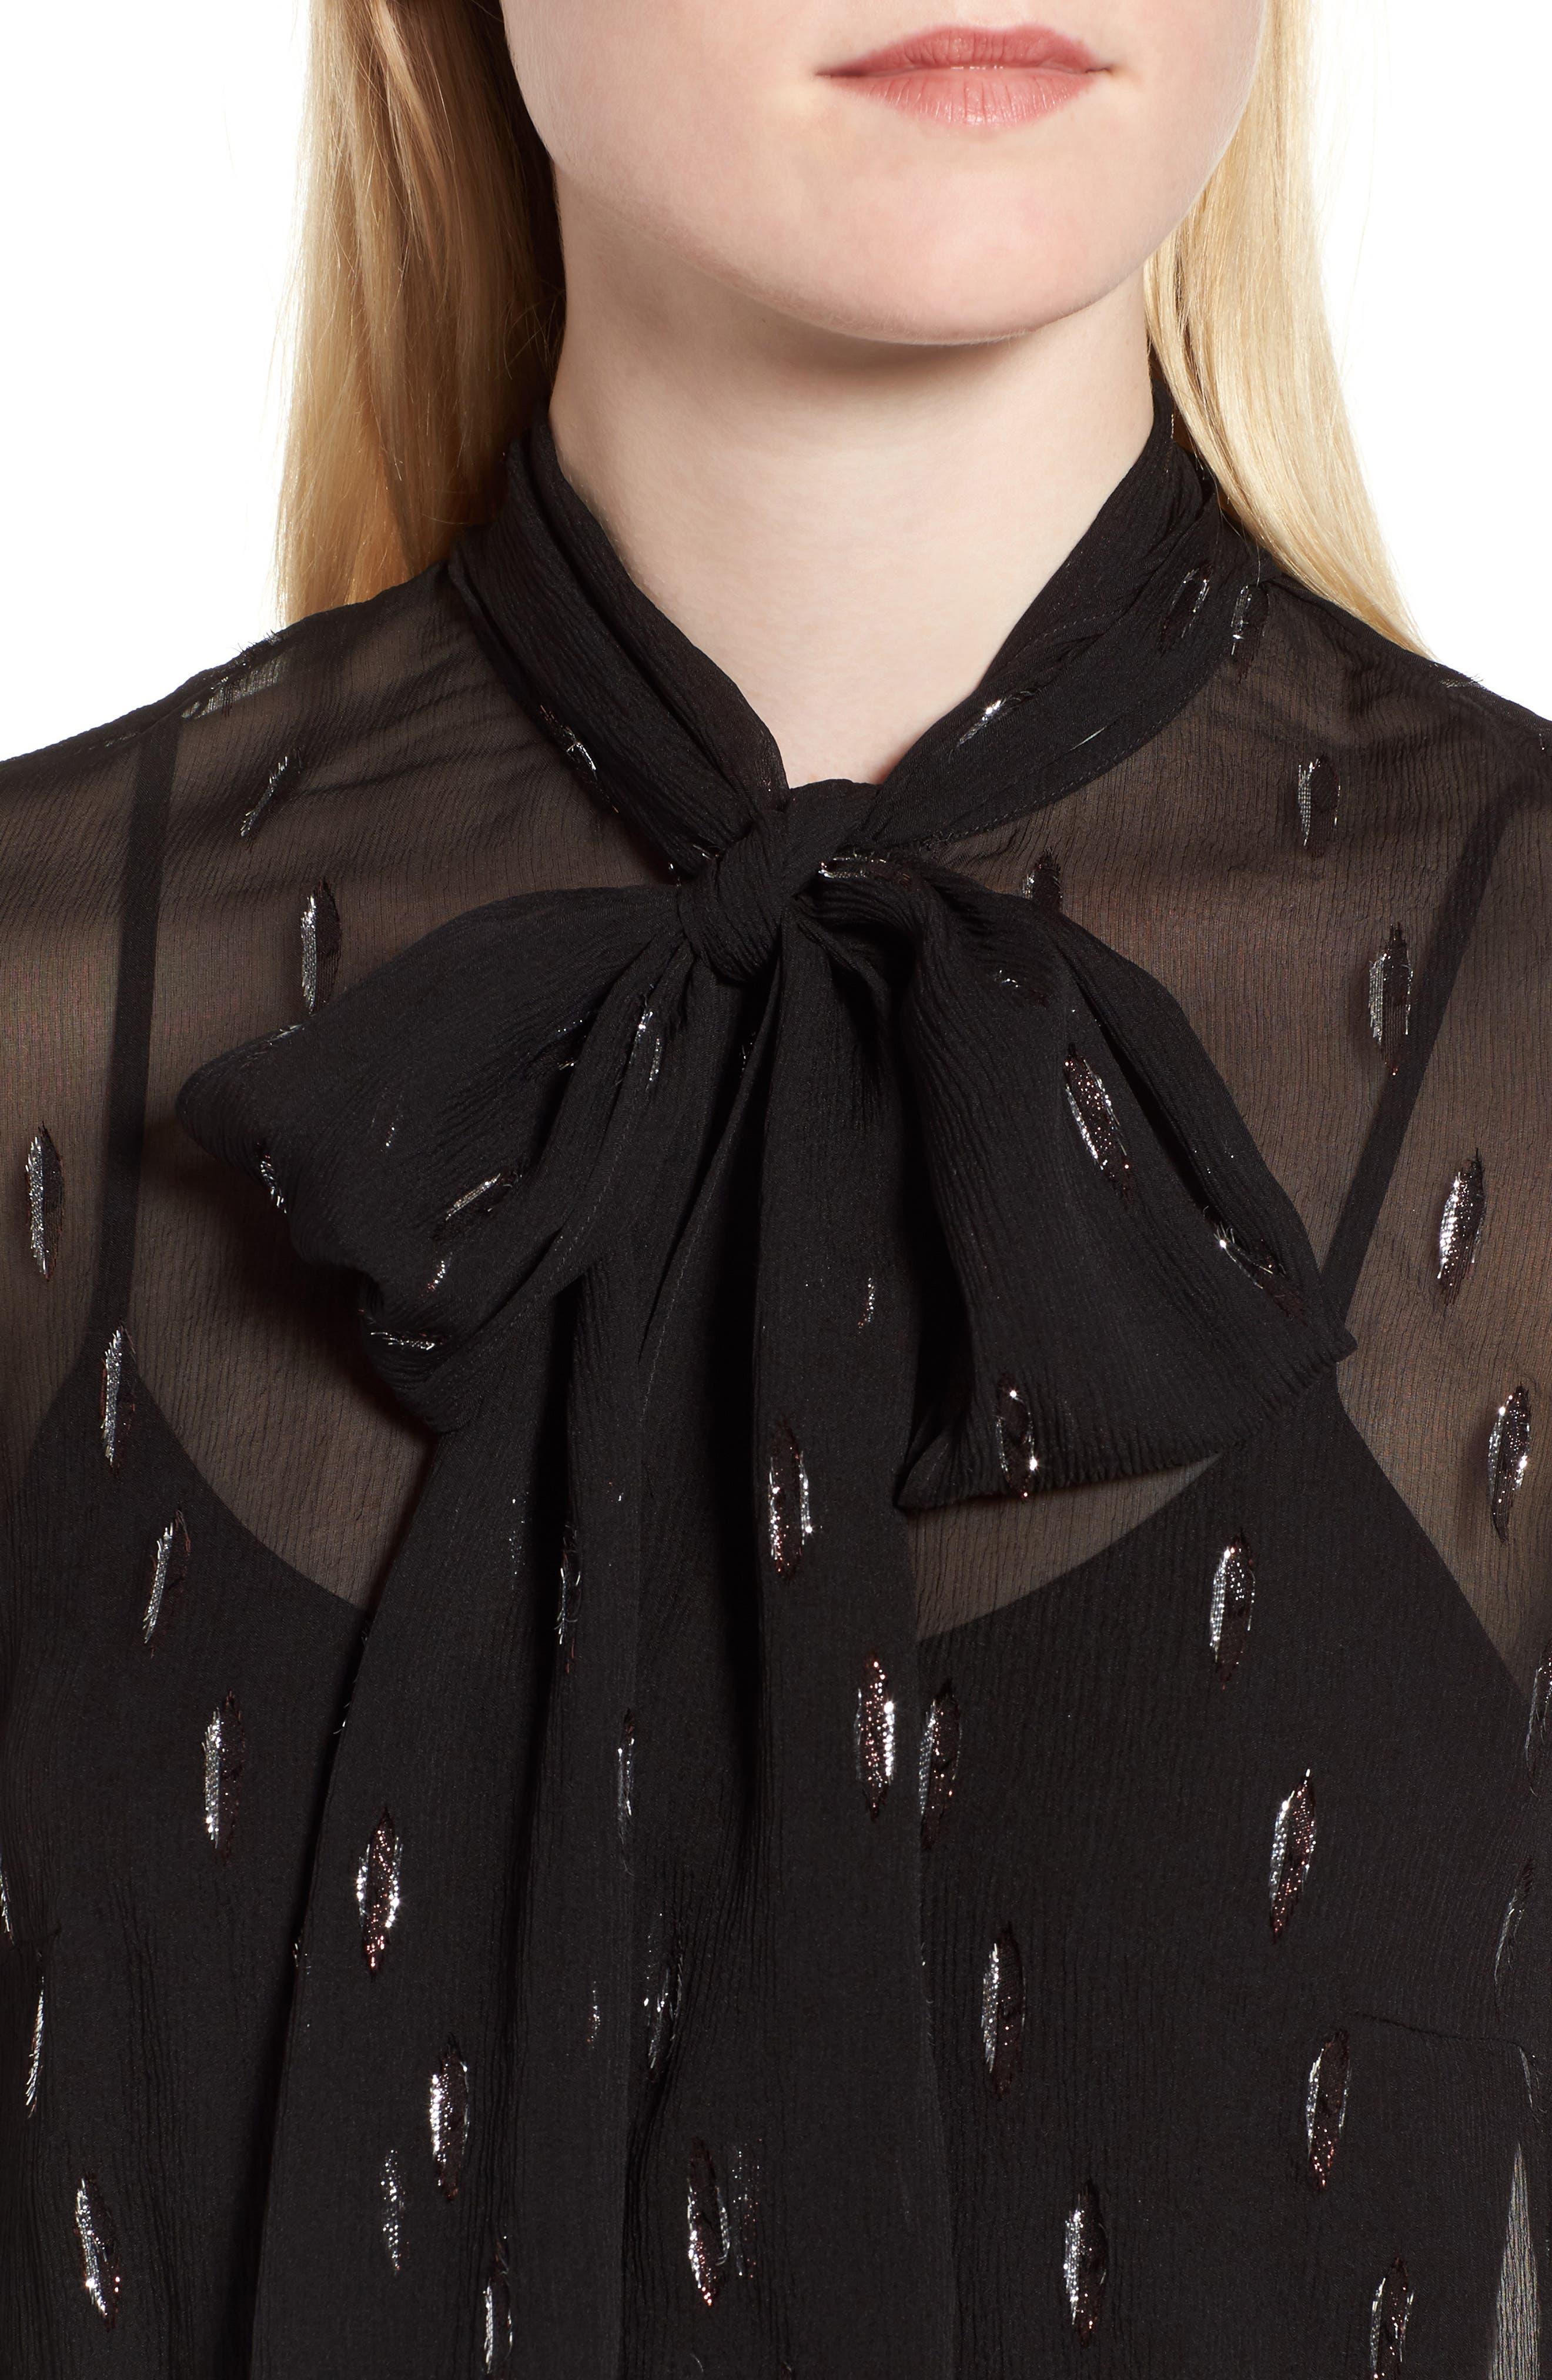 Bavimea Tie Neck Metallic Detail Blouse,                             Alternate thumbnail 5, color,                             Black Fantasy